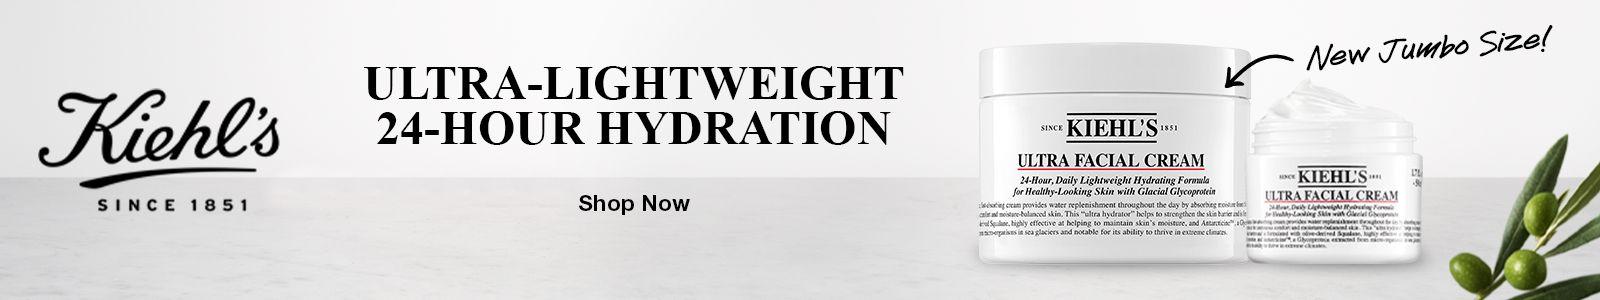 Kiehl's, Since 1851, Ultra-Lightweight 24-Hour Hydration, Shop Now, New Jumbo Size